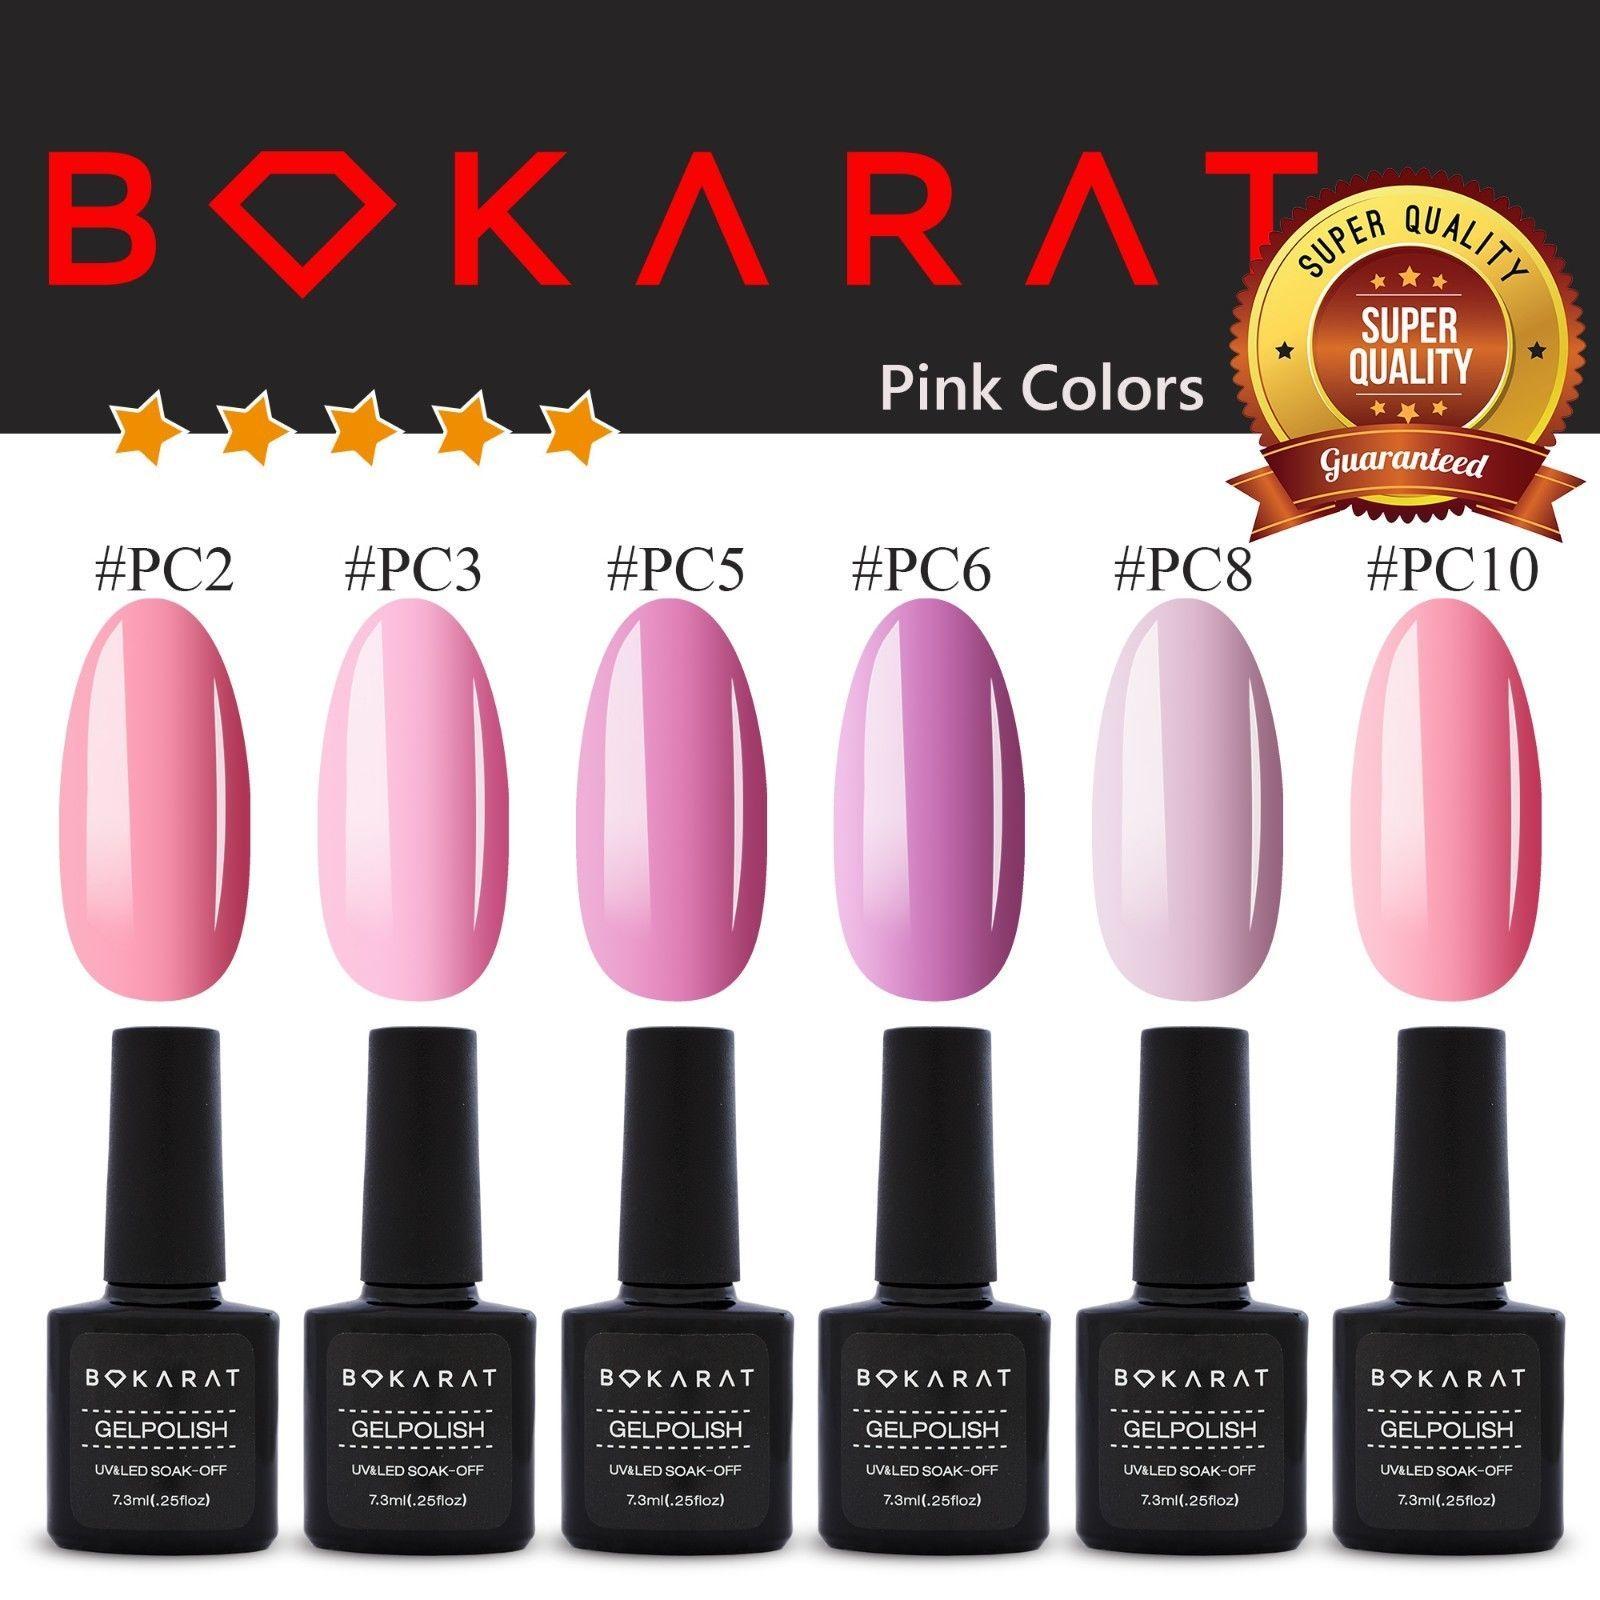 ~Pink Colors~ Bokarat Gel Nail Polish 7.3 ml Soak Off UV LED ~High Quality~